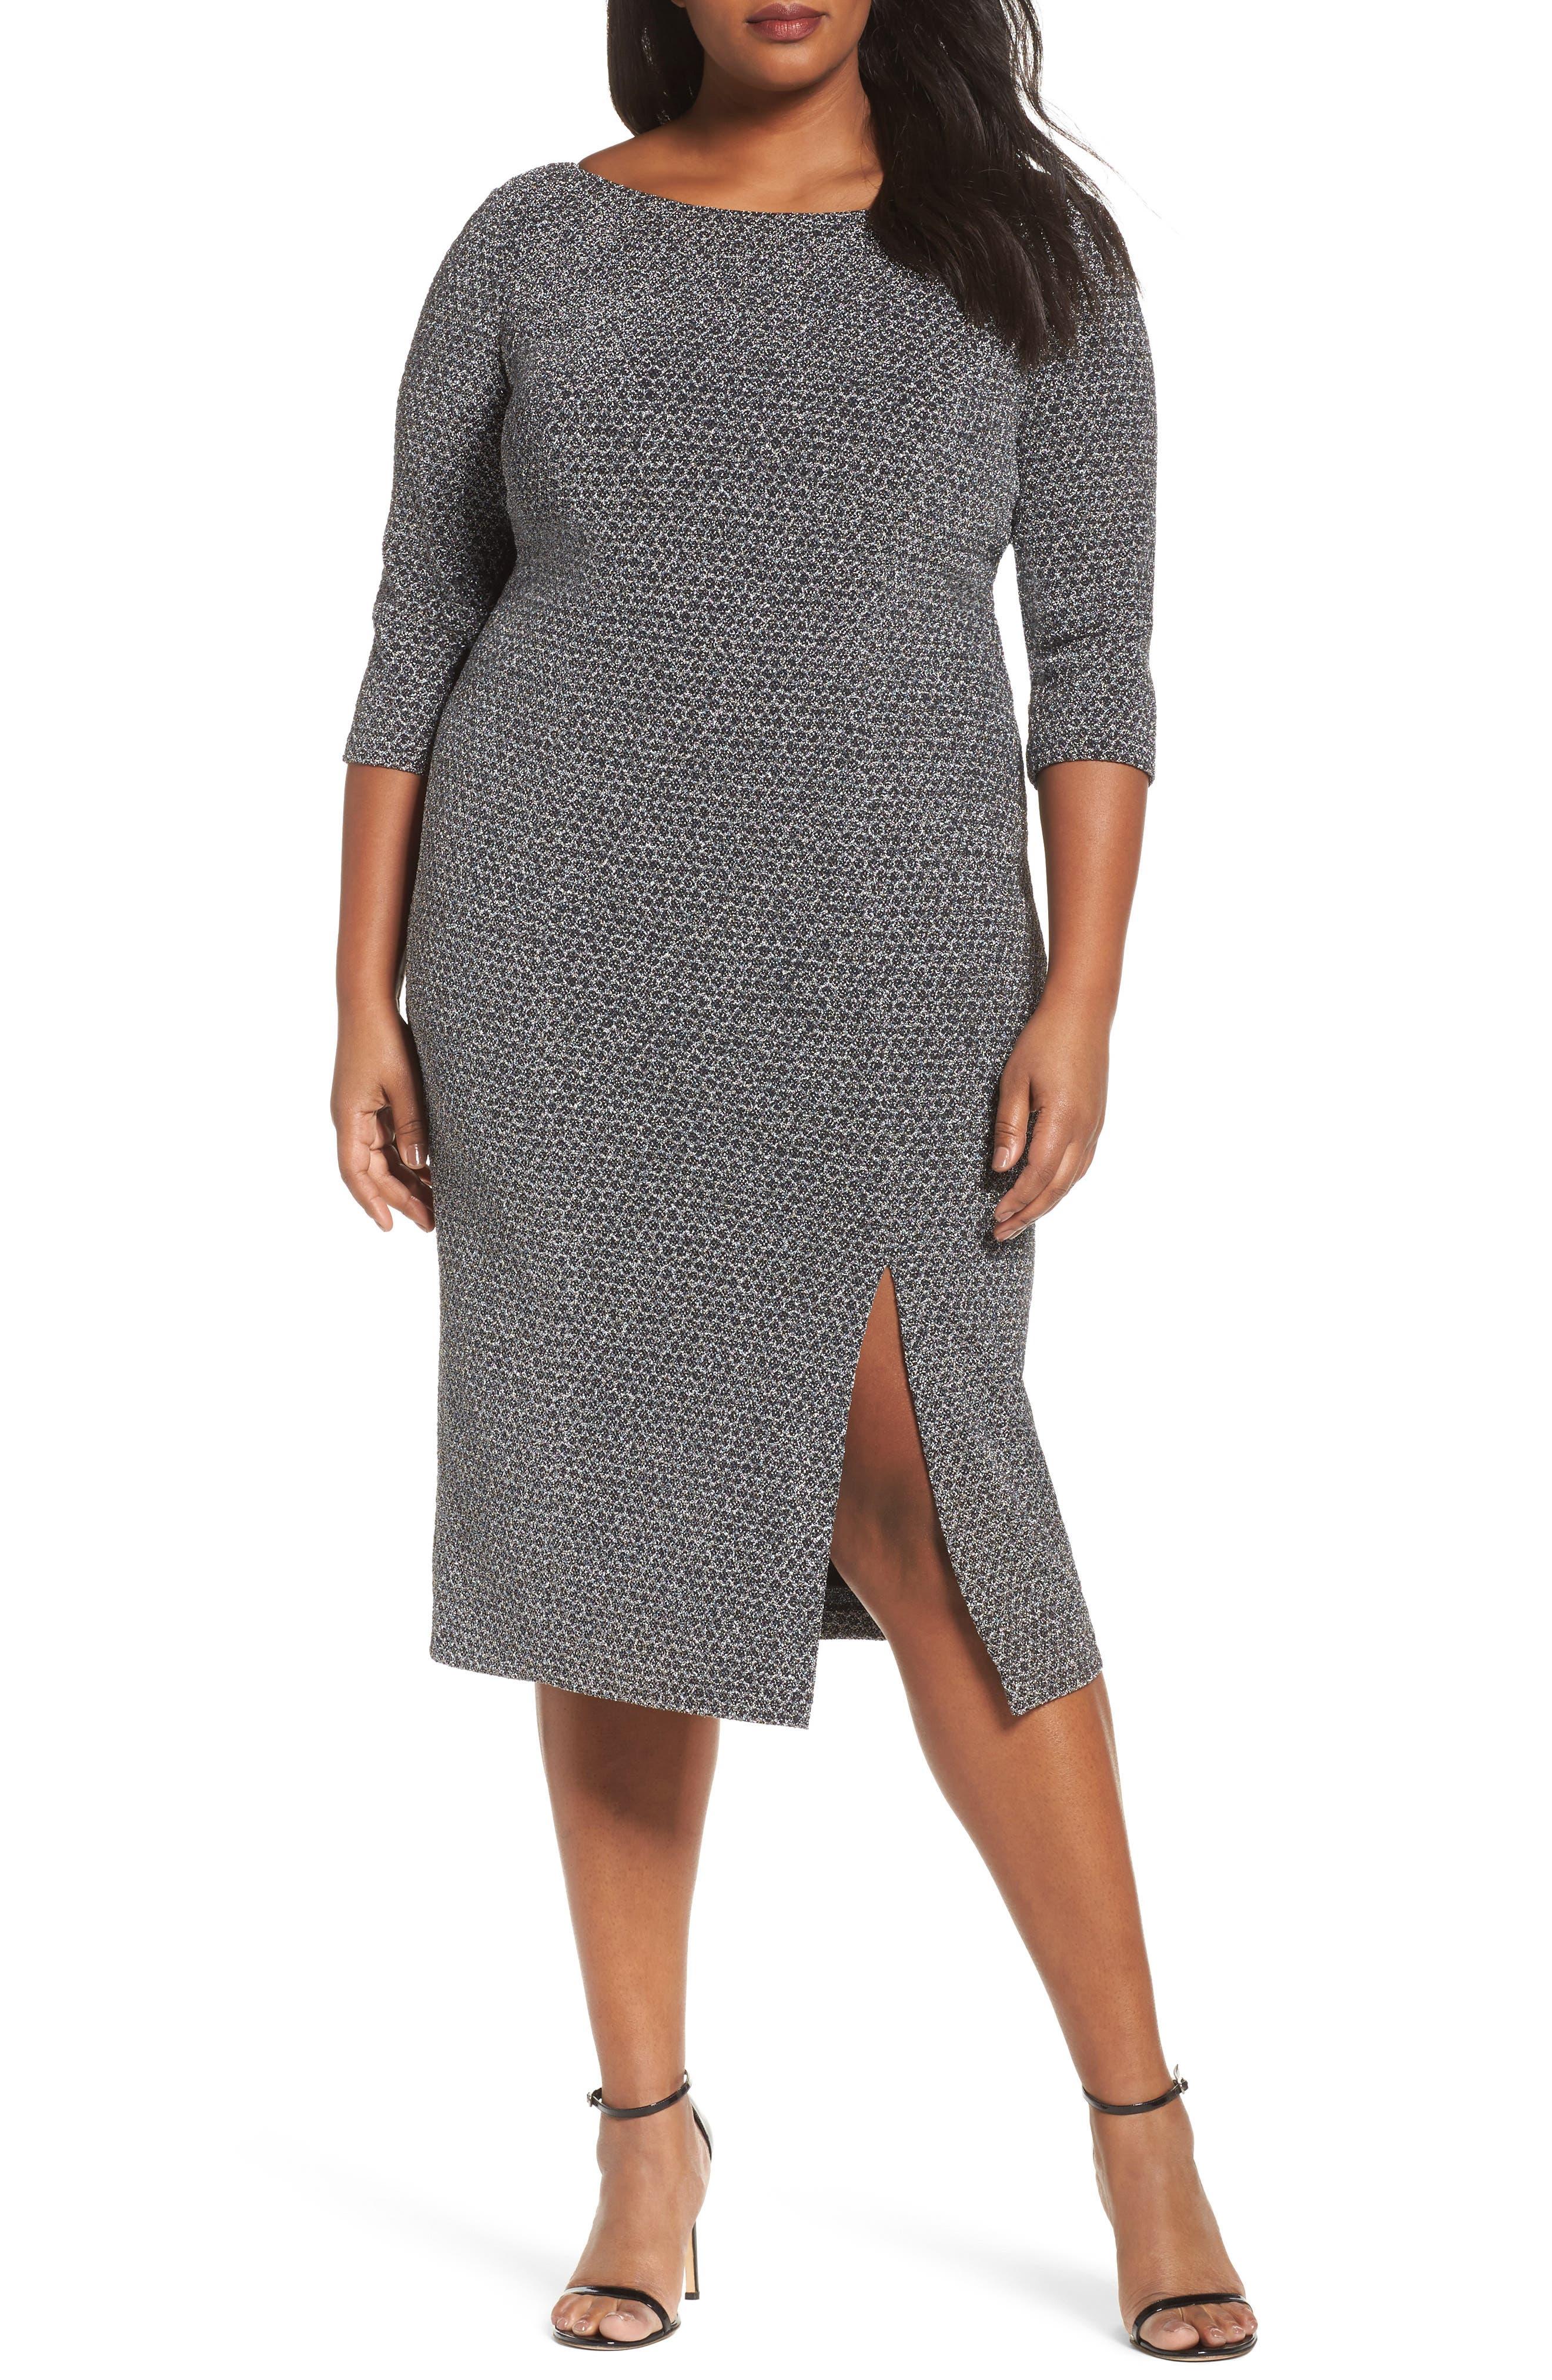 Alternate Image 1 Selected - Adrianna Papell Glitter Knit Sheath Dress (Plus Size)